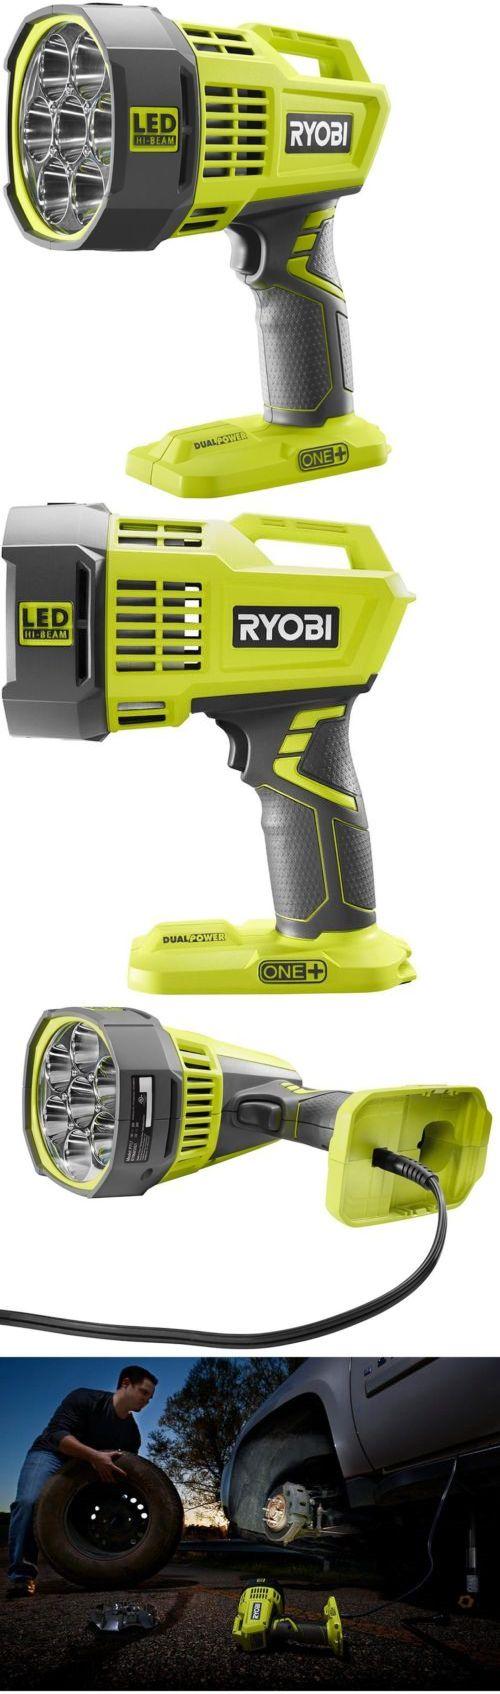 Flashlights 20760: Ryobi 18-Volt One+ Dual Power Led Spotlight Cordless Battery Powered Lighting -> BUY IT NOW ONLY: $66.46 on eBay!